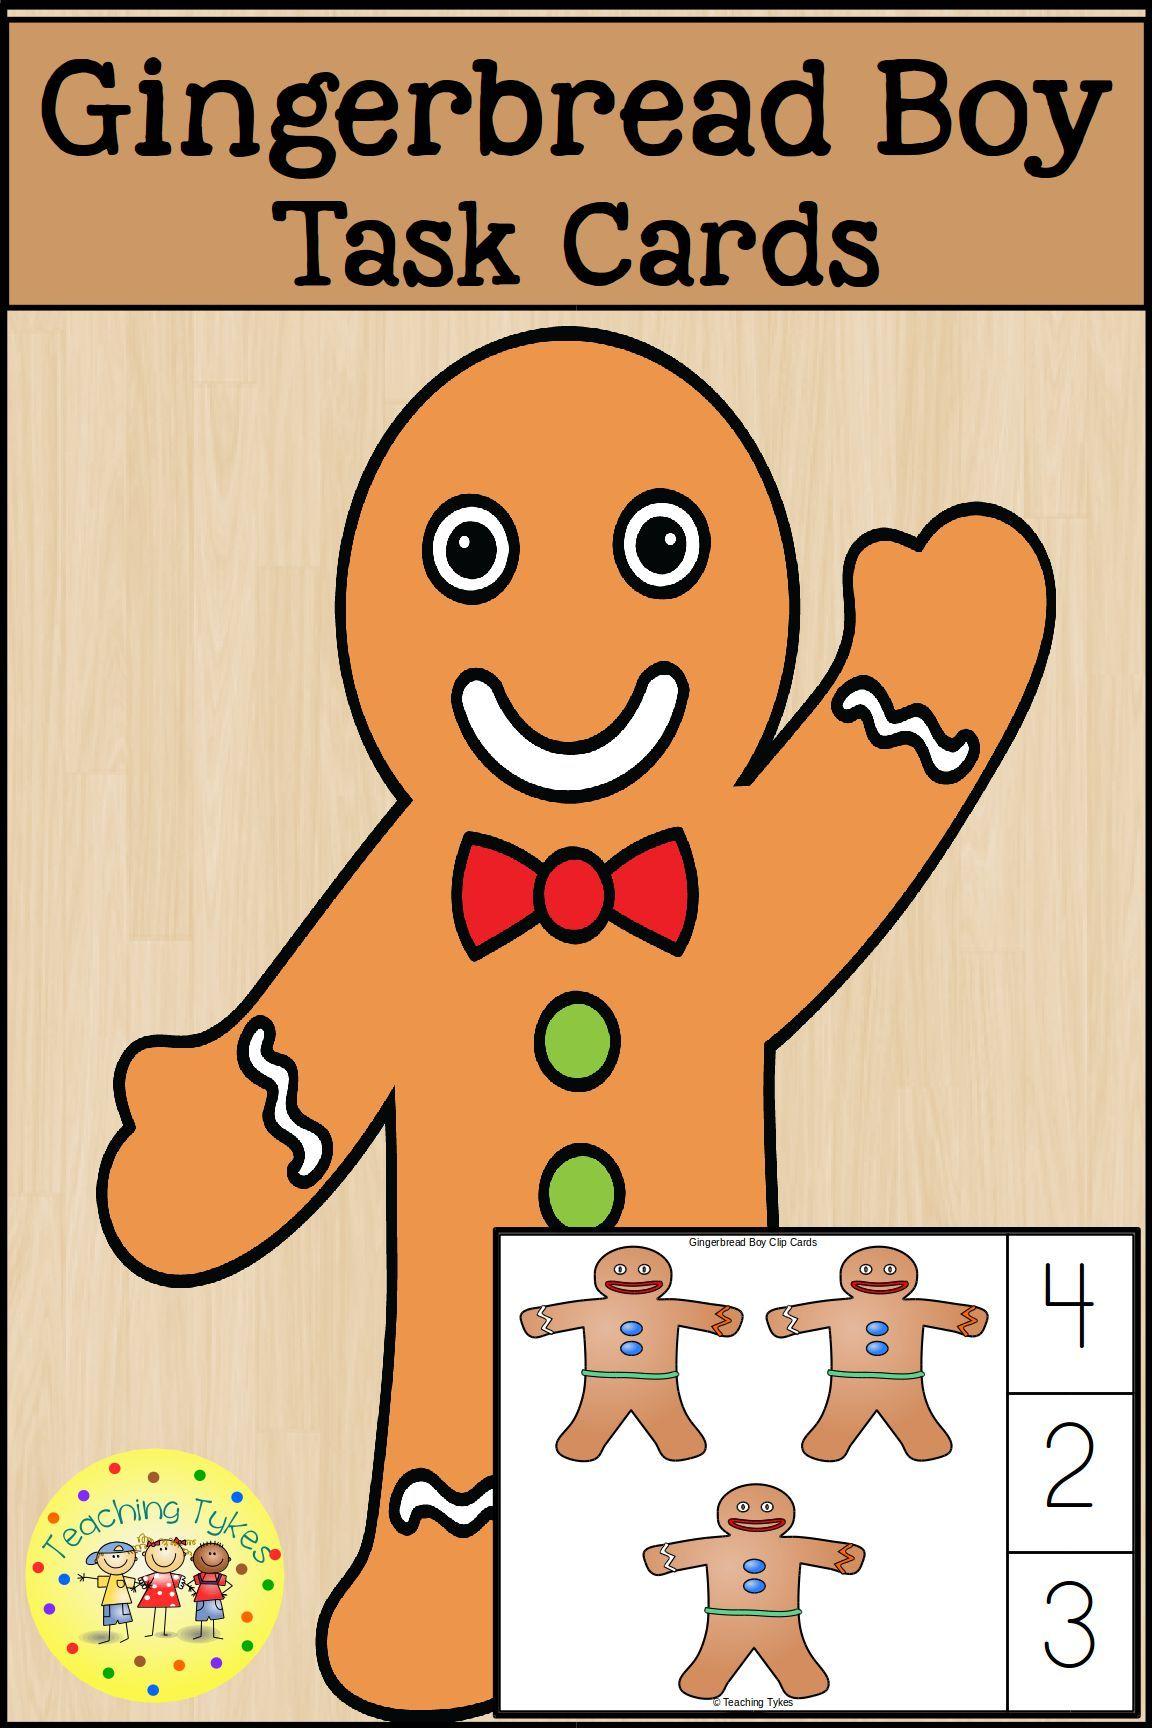 Gingerbread Men And Turkeys Task Cards